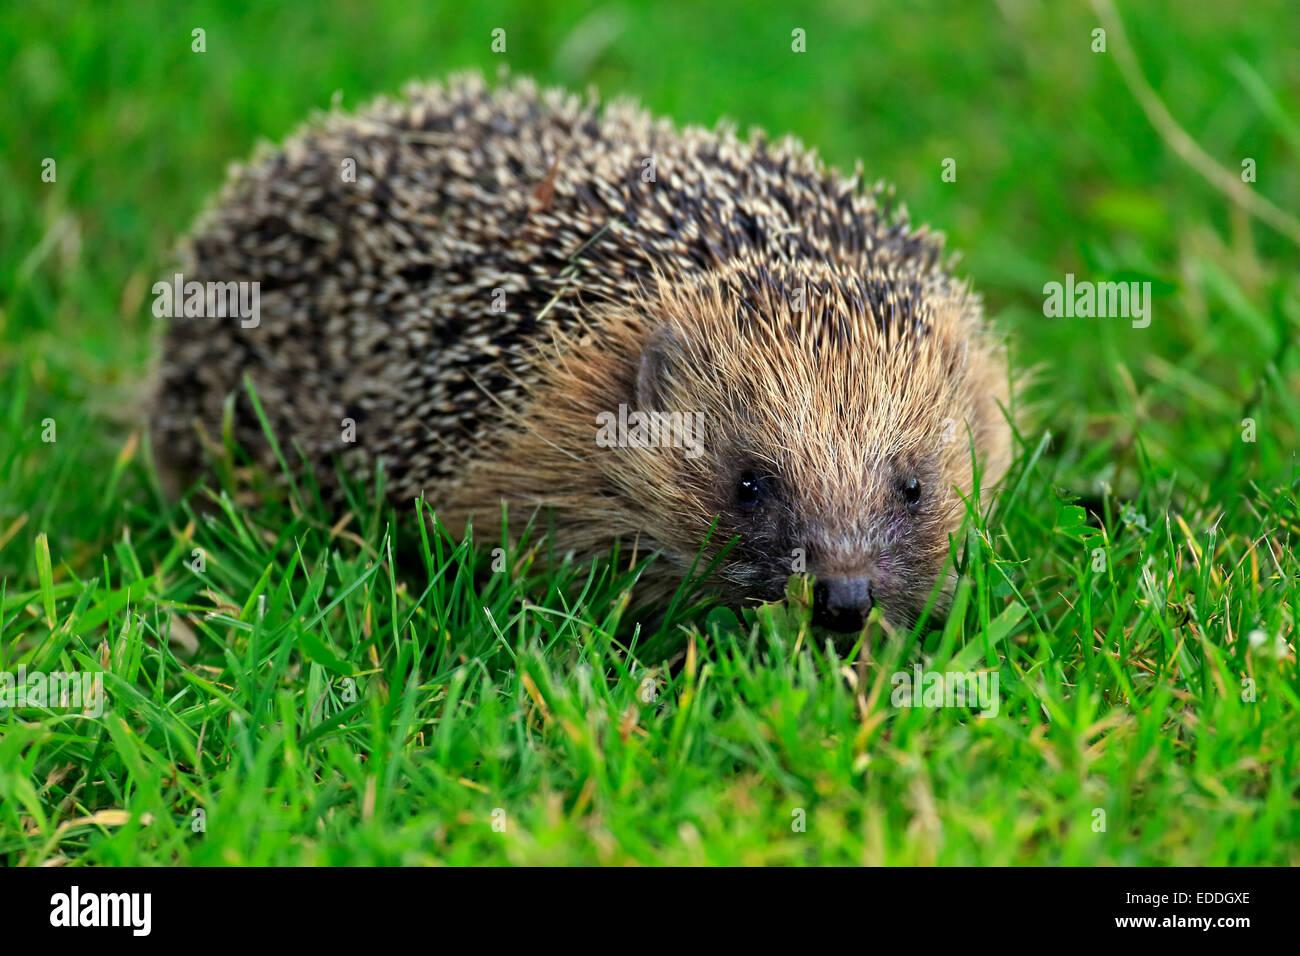 Hedgehog (Erinaceus europaeus), adult, Surrey, England, United Kingdom - Stock Image